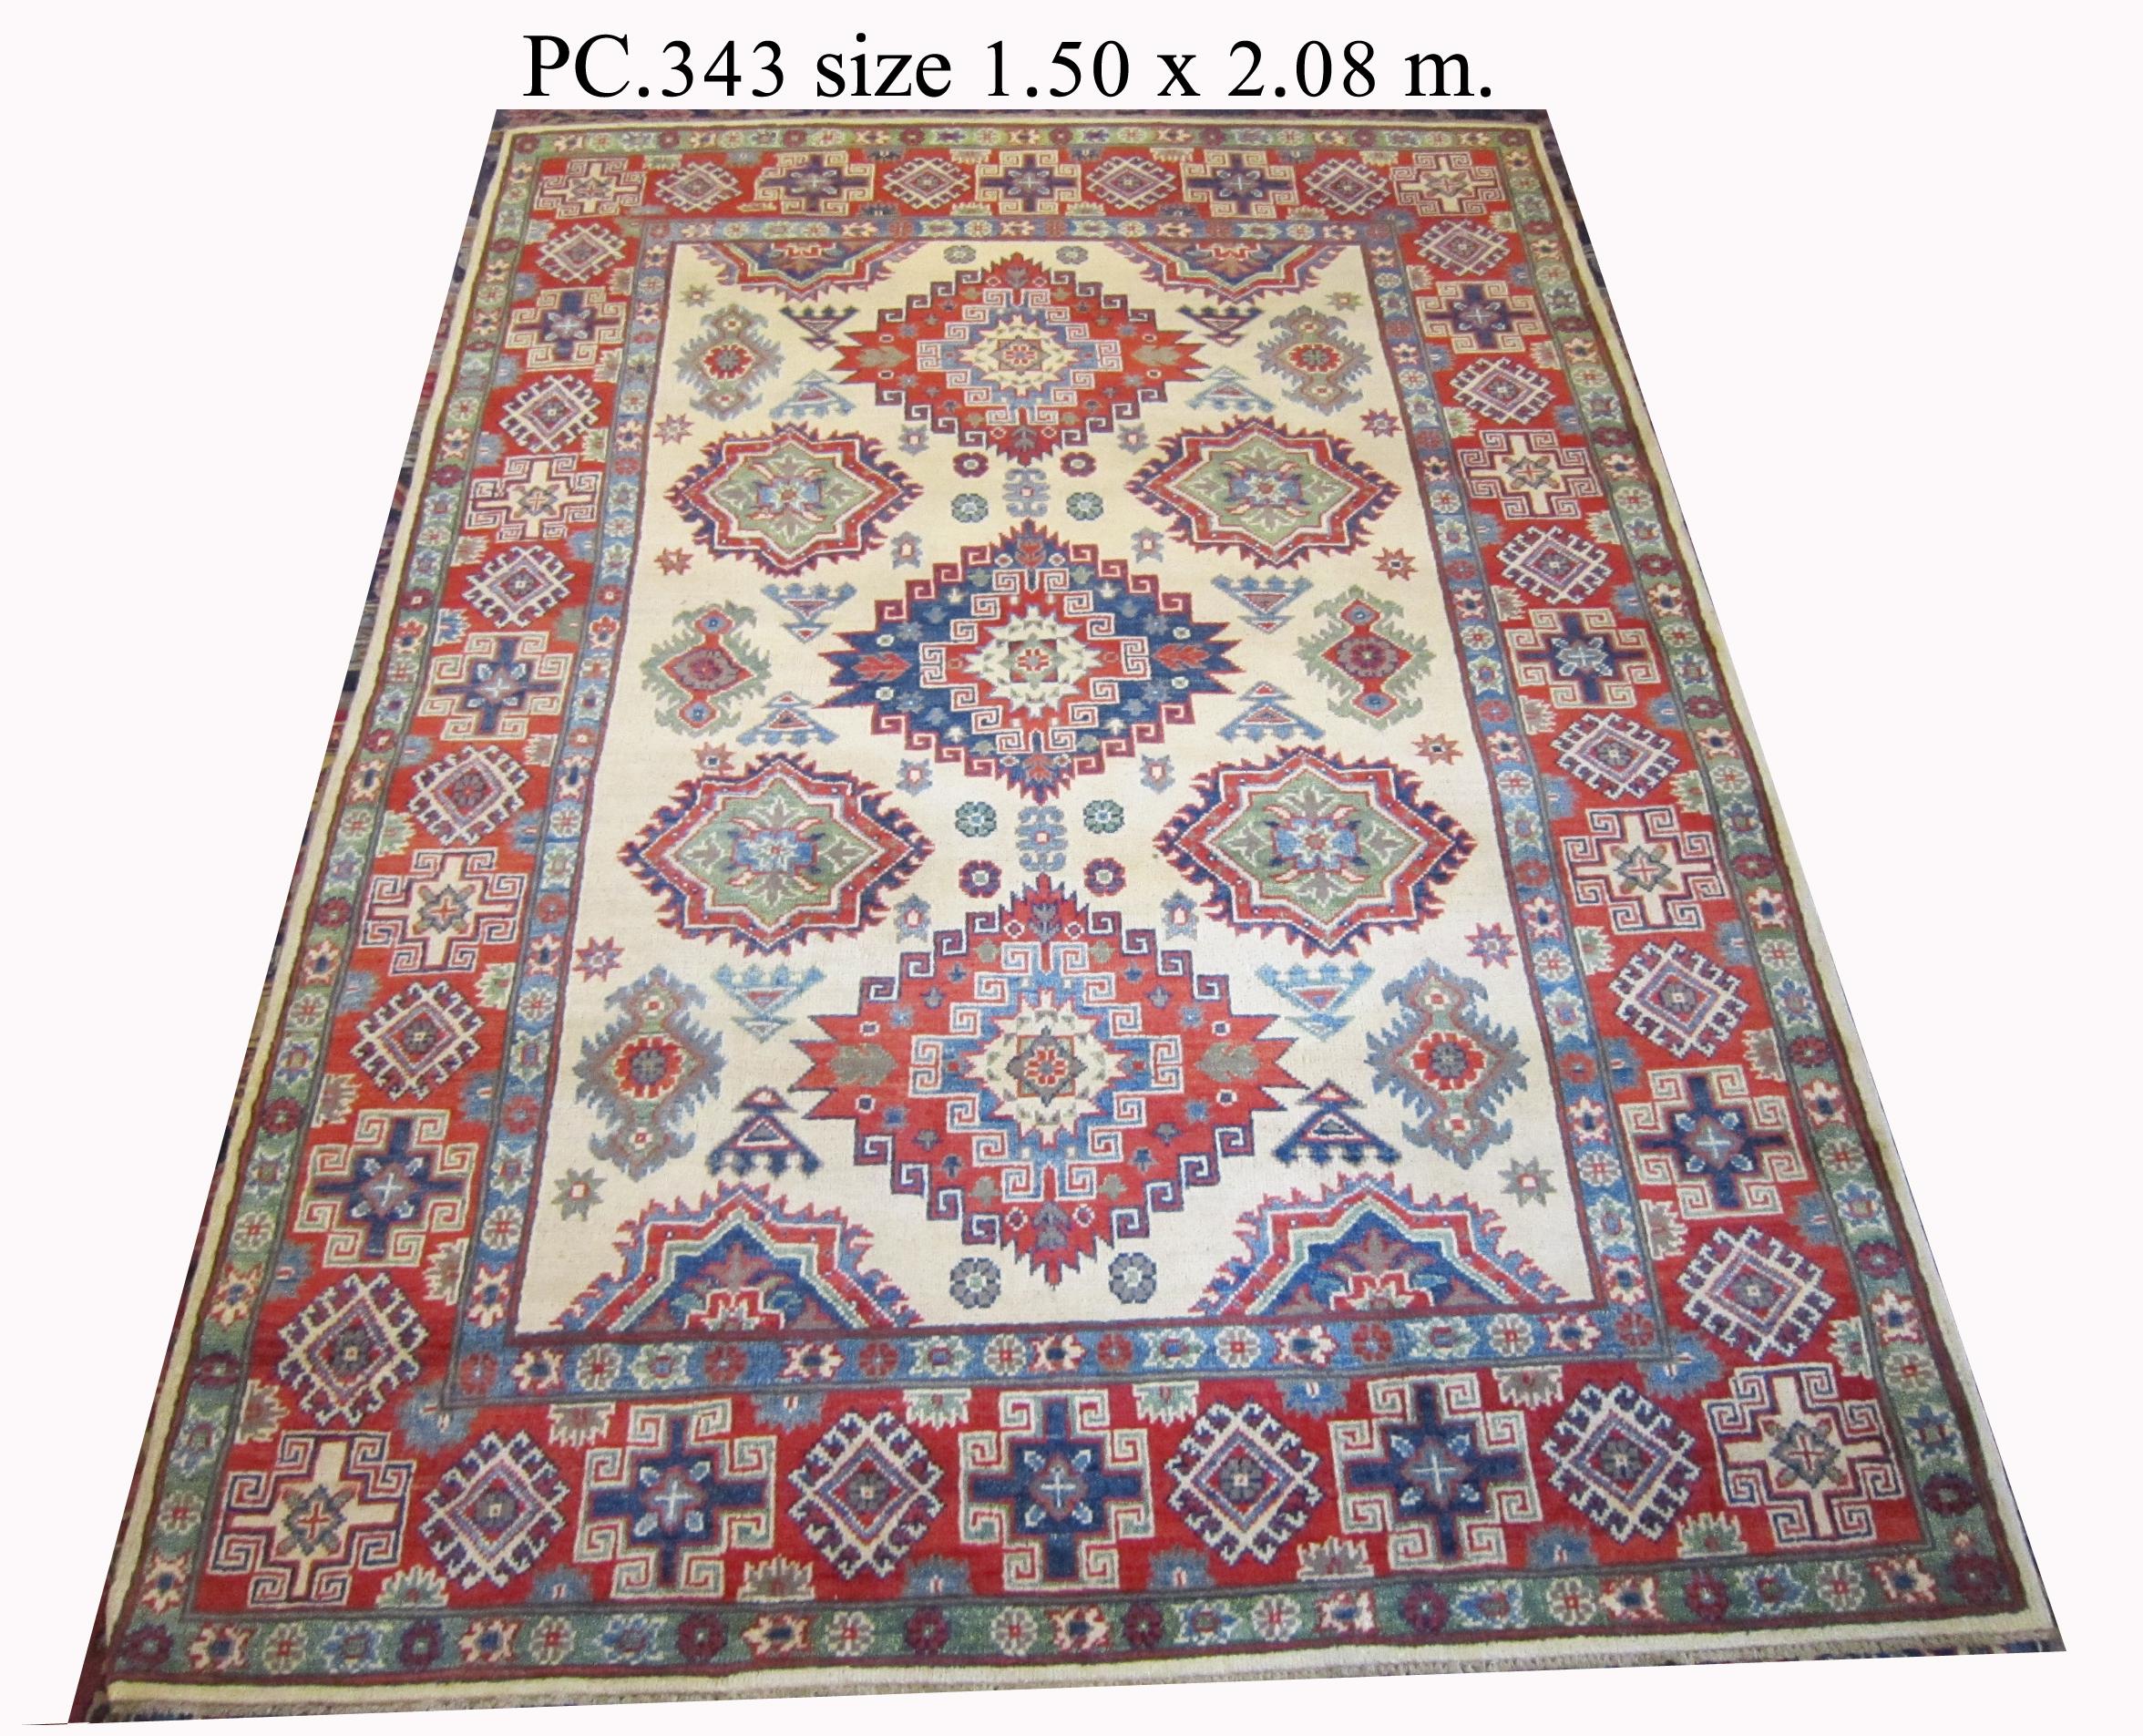 Gallery persian carpets bangkok thailand for Esstisch 1 40 m